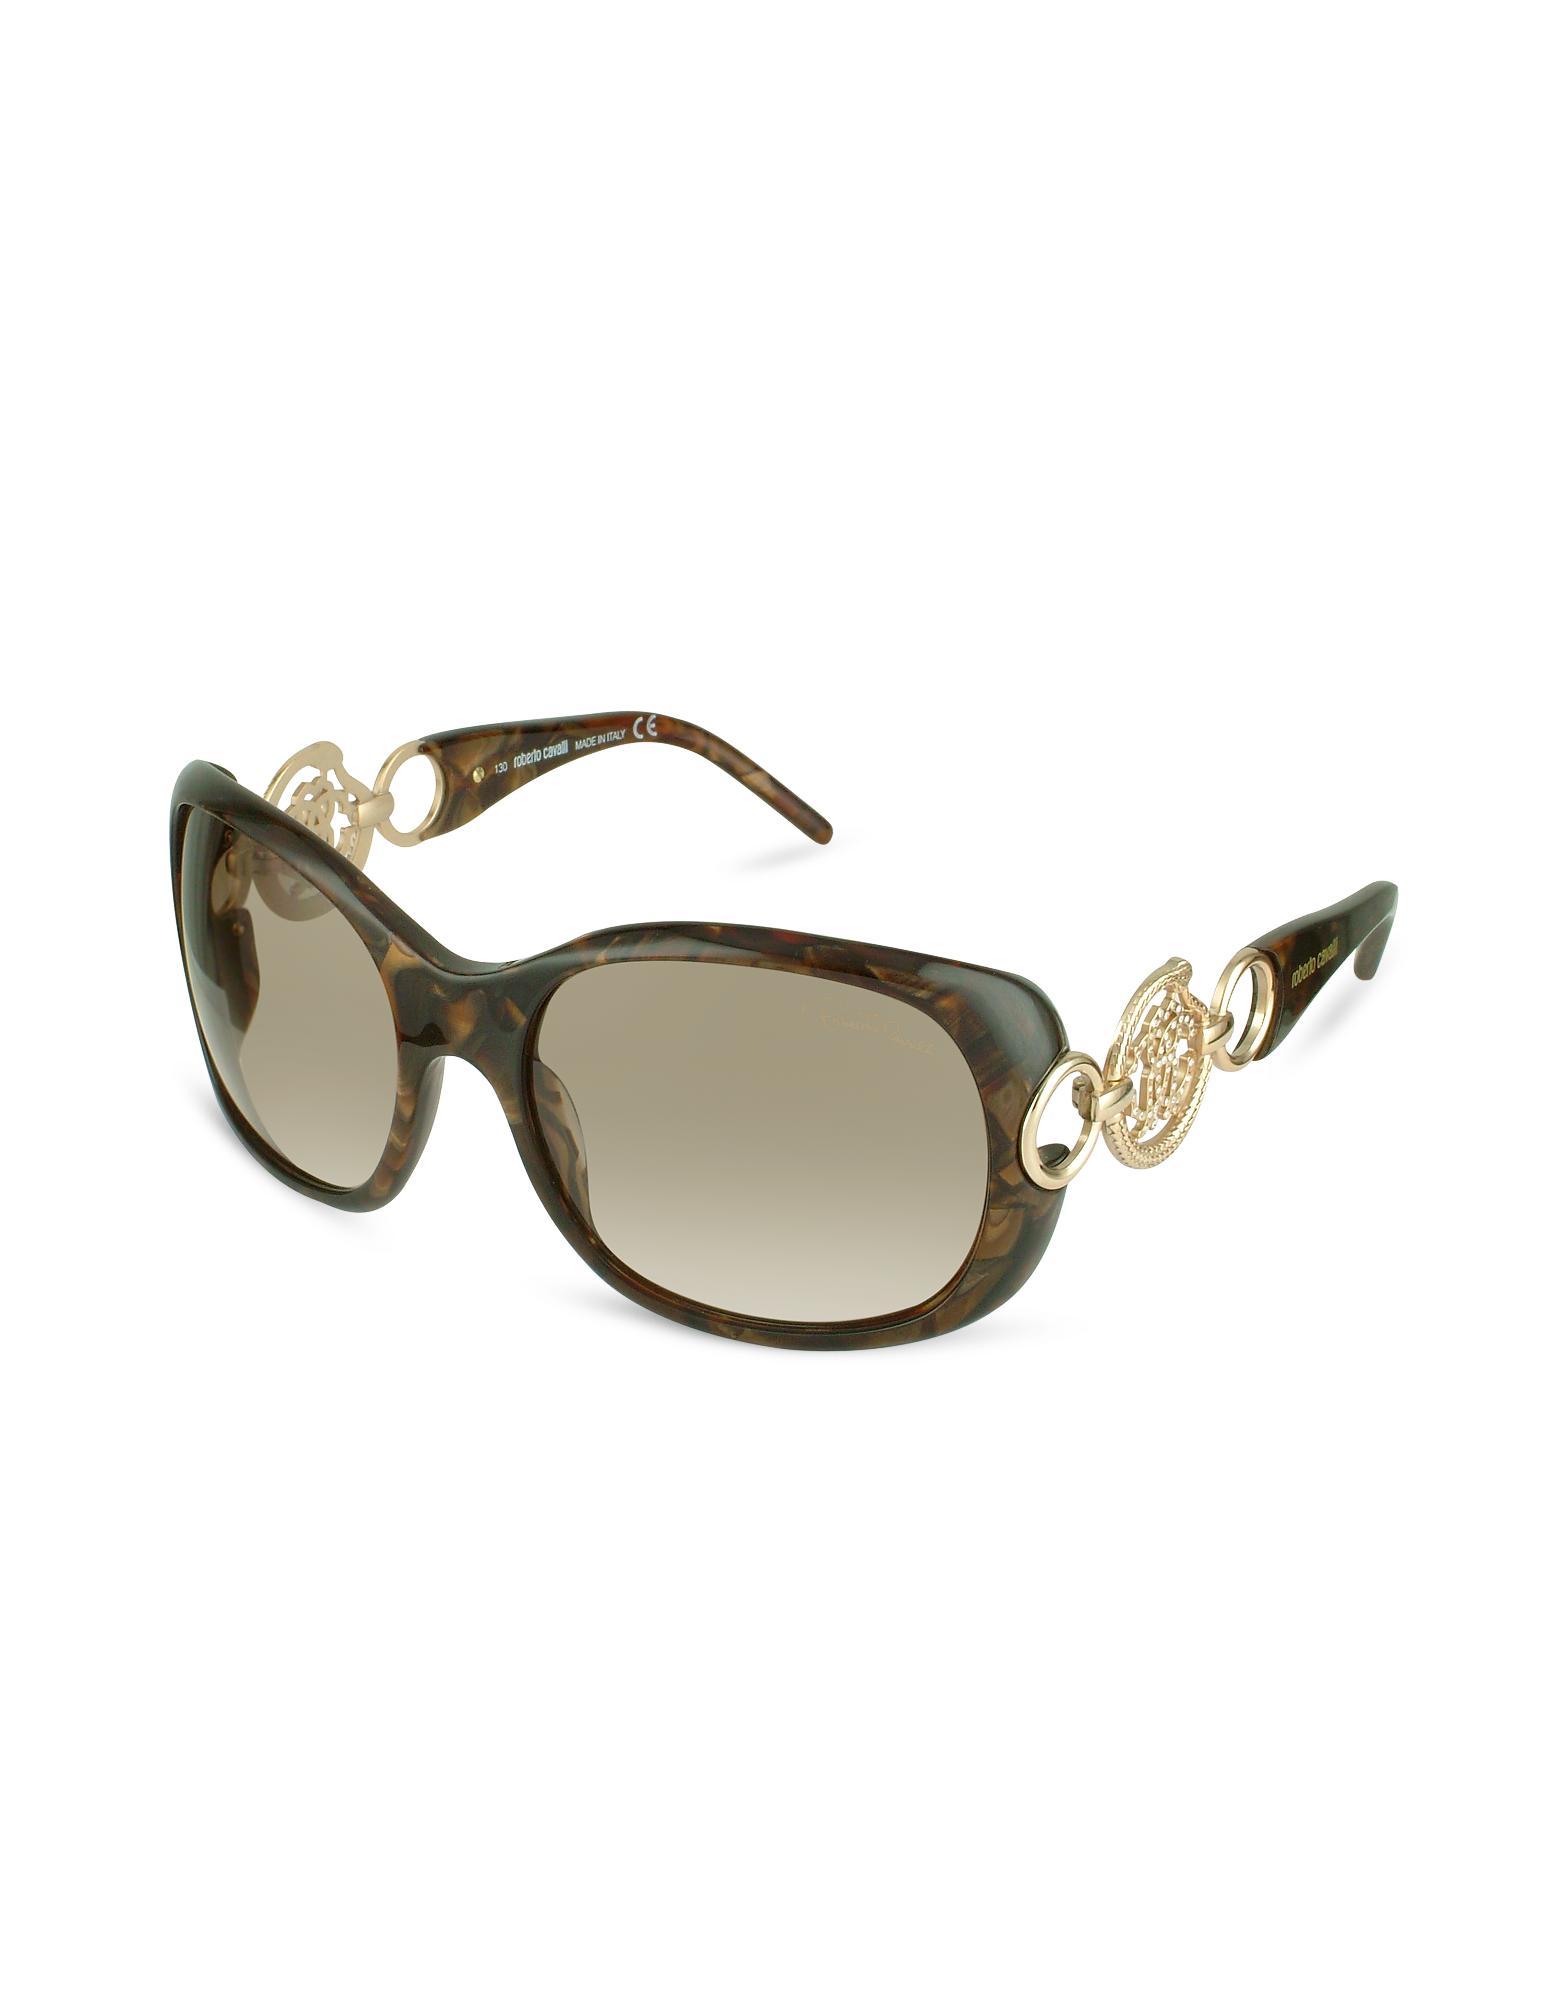 Roberto Cavalli Rubino - Cutout Logo Temple Sunglasses